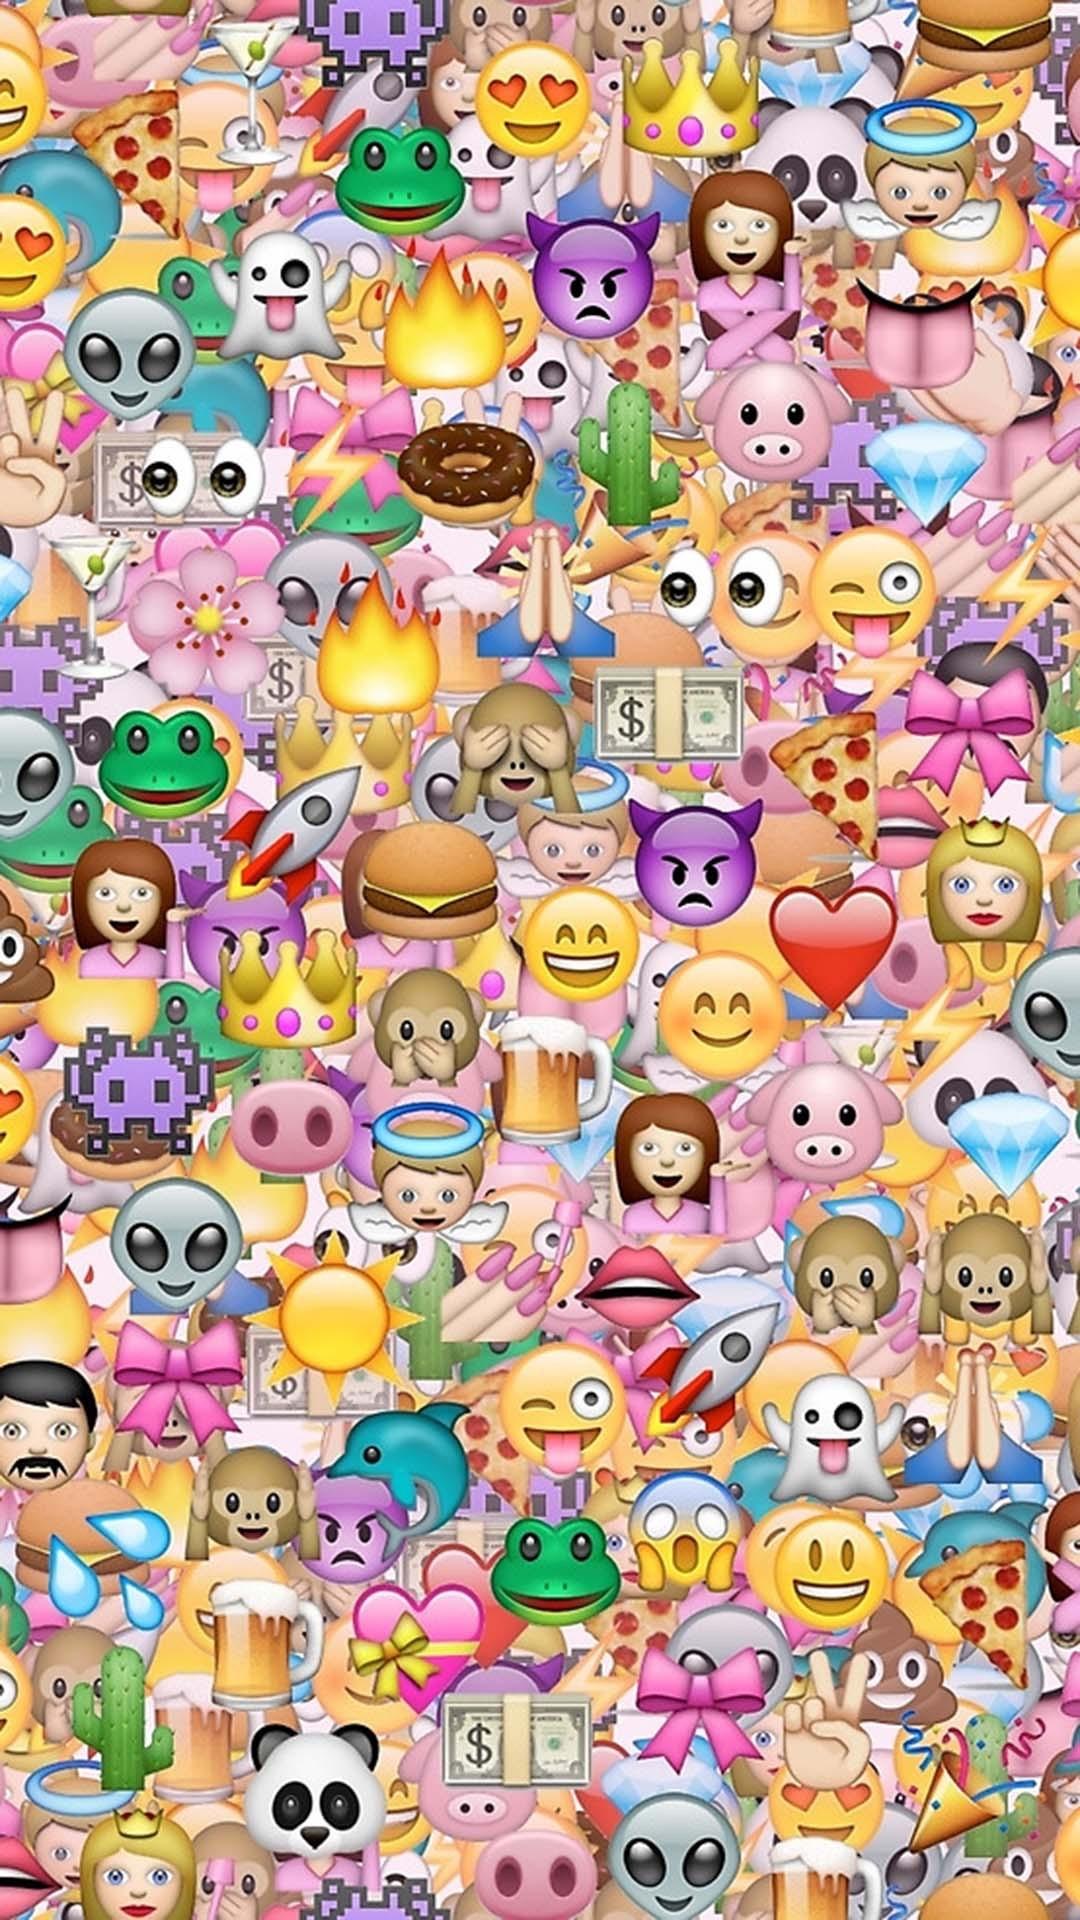 3d Wallpaper App For Iphone Emoji Computer Wallpaper 66 Images